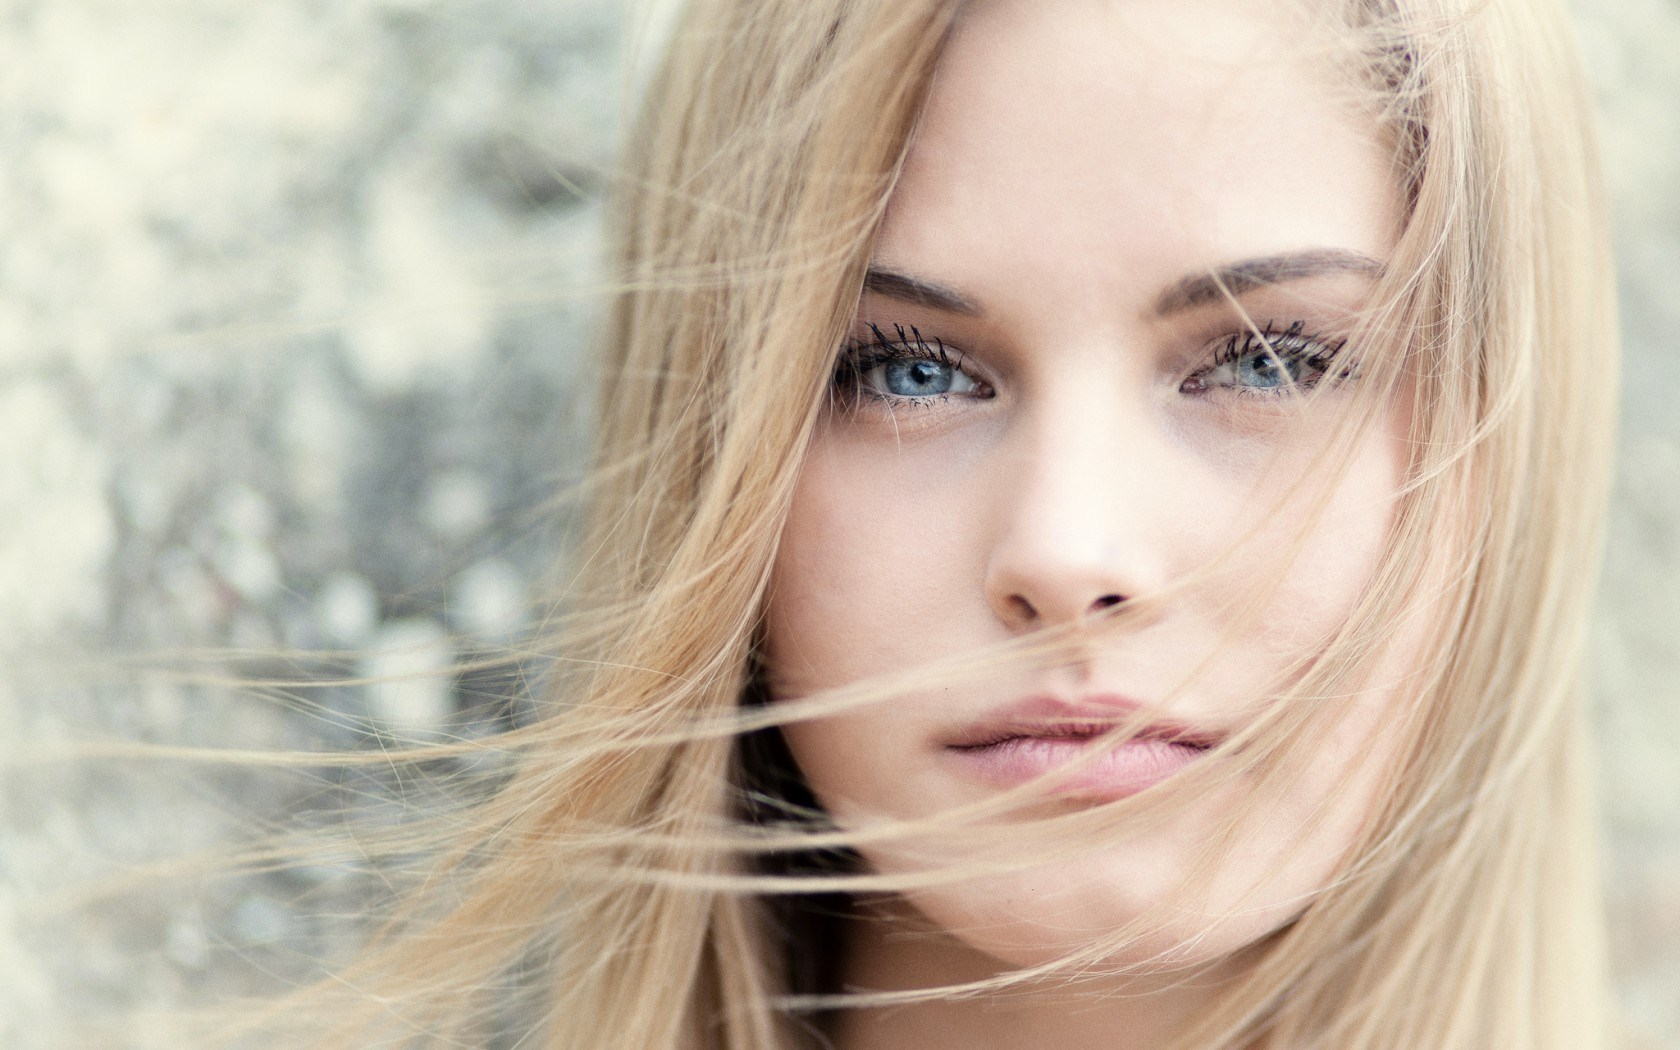 Girl Photo Blonde Hair